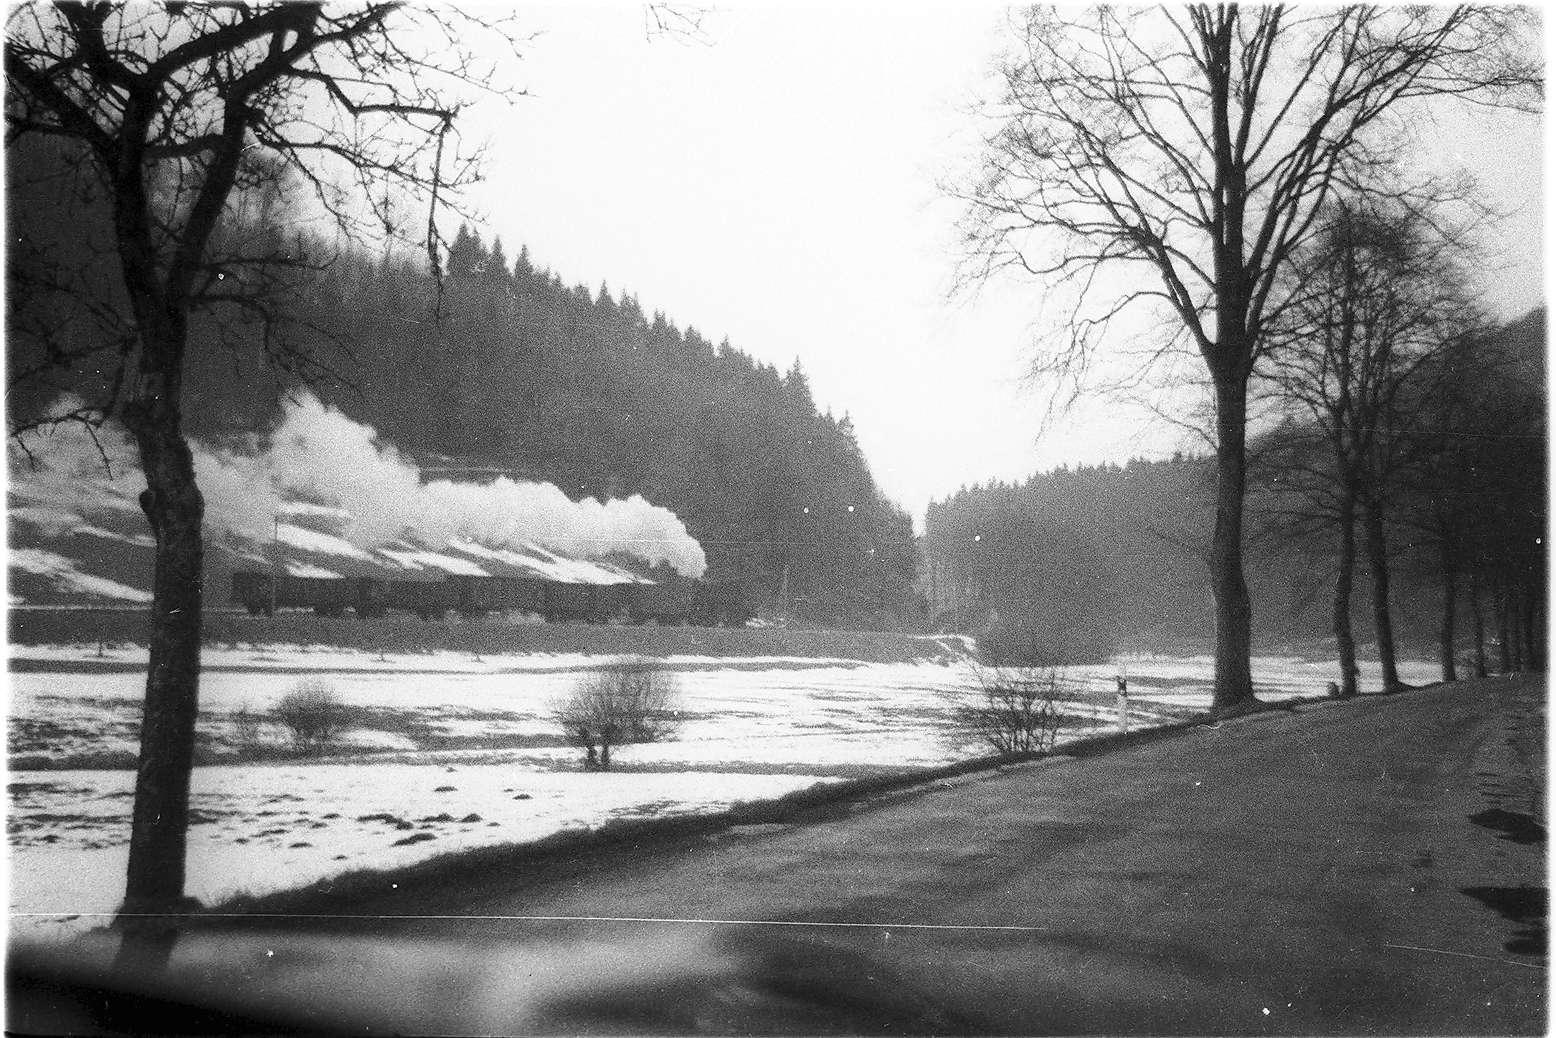 Lok 141, 52/ 53, Gammertingen - Trochtelfingen, Seckachtal, Blick aus einem Auto, Bild 1